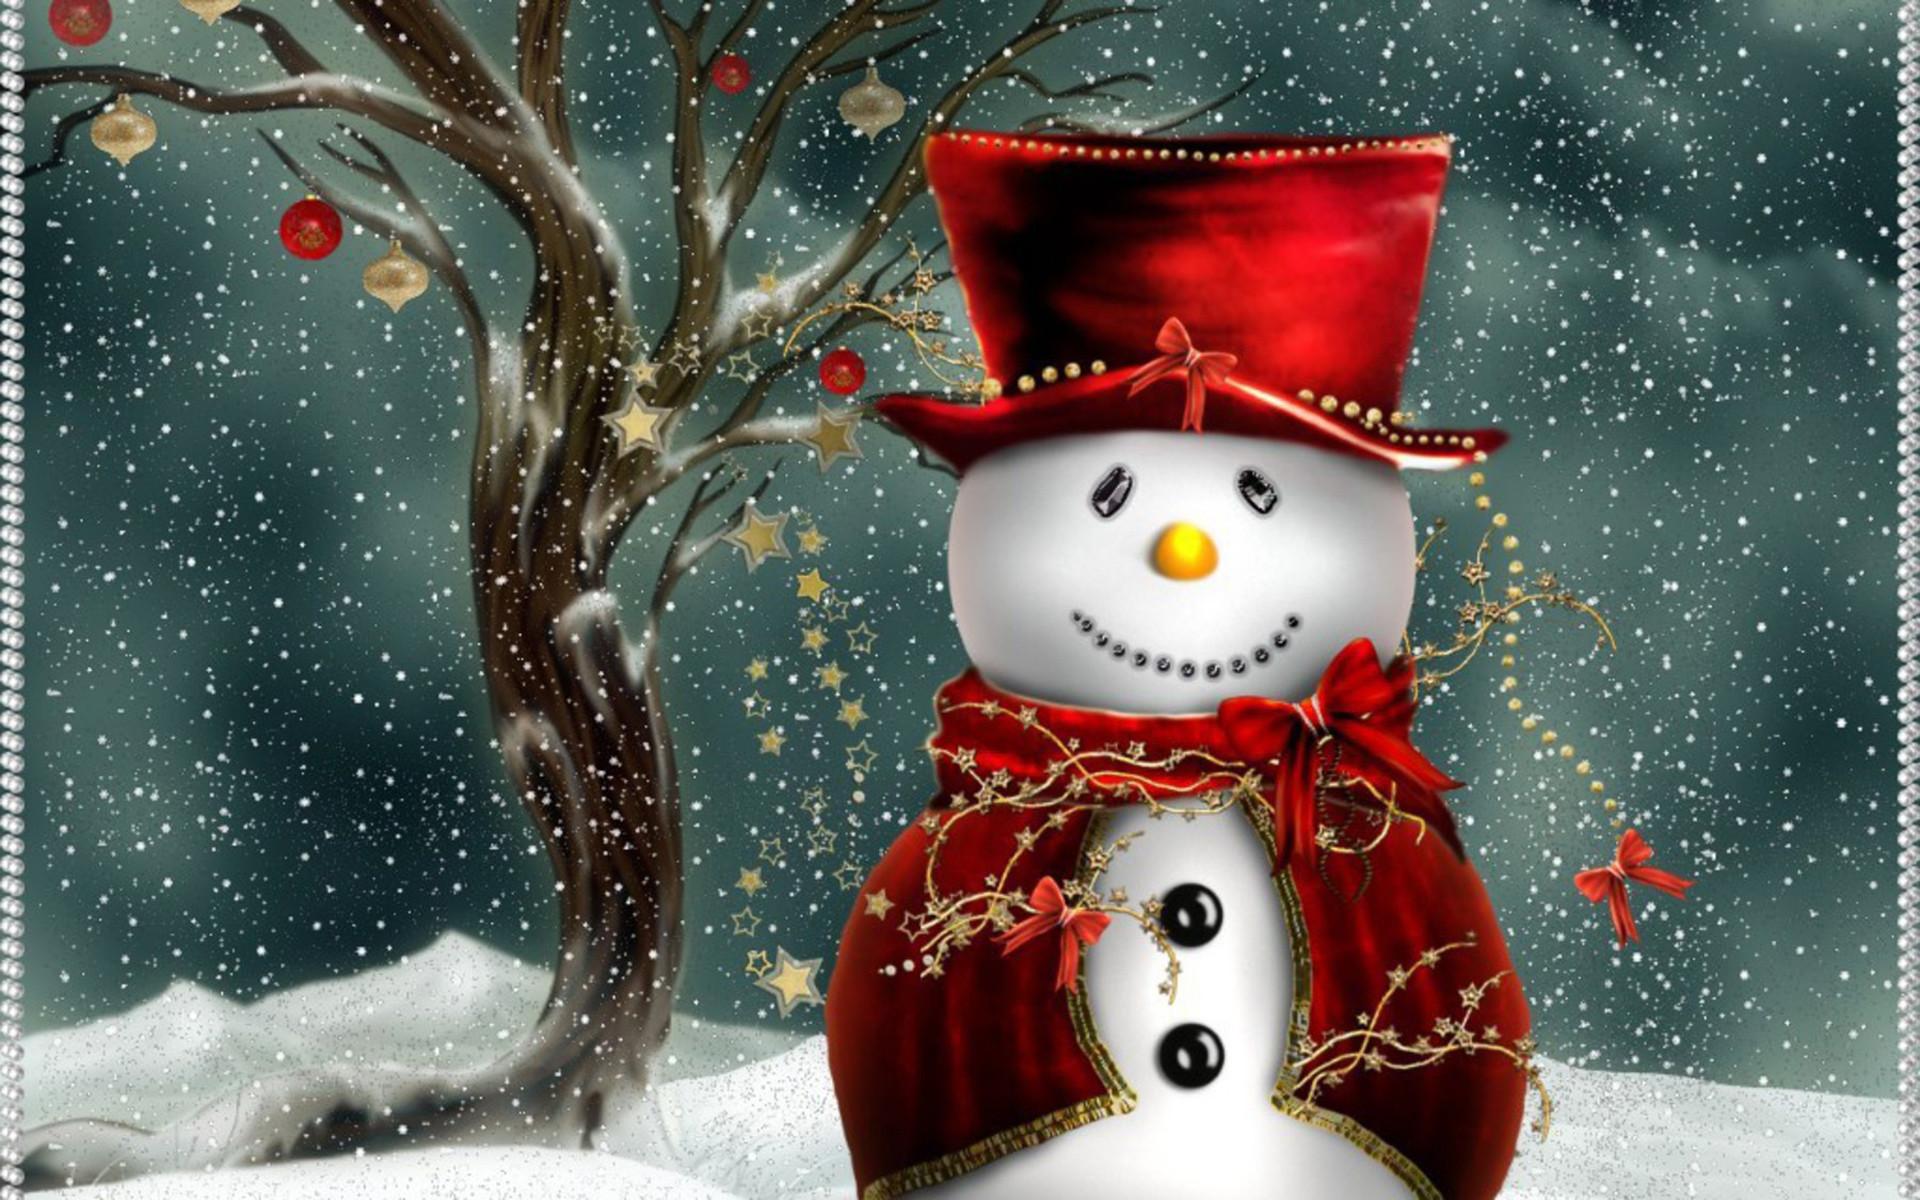 free desktop wallpaper of cute christmas snowman free computer desktop .